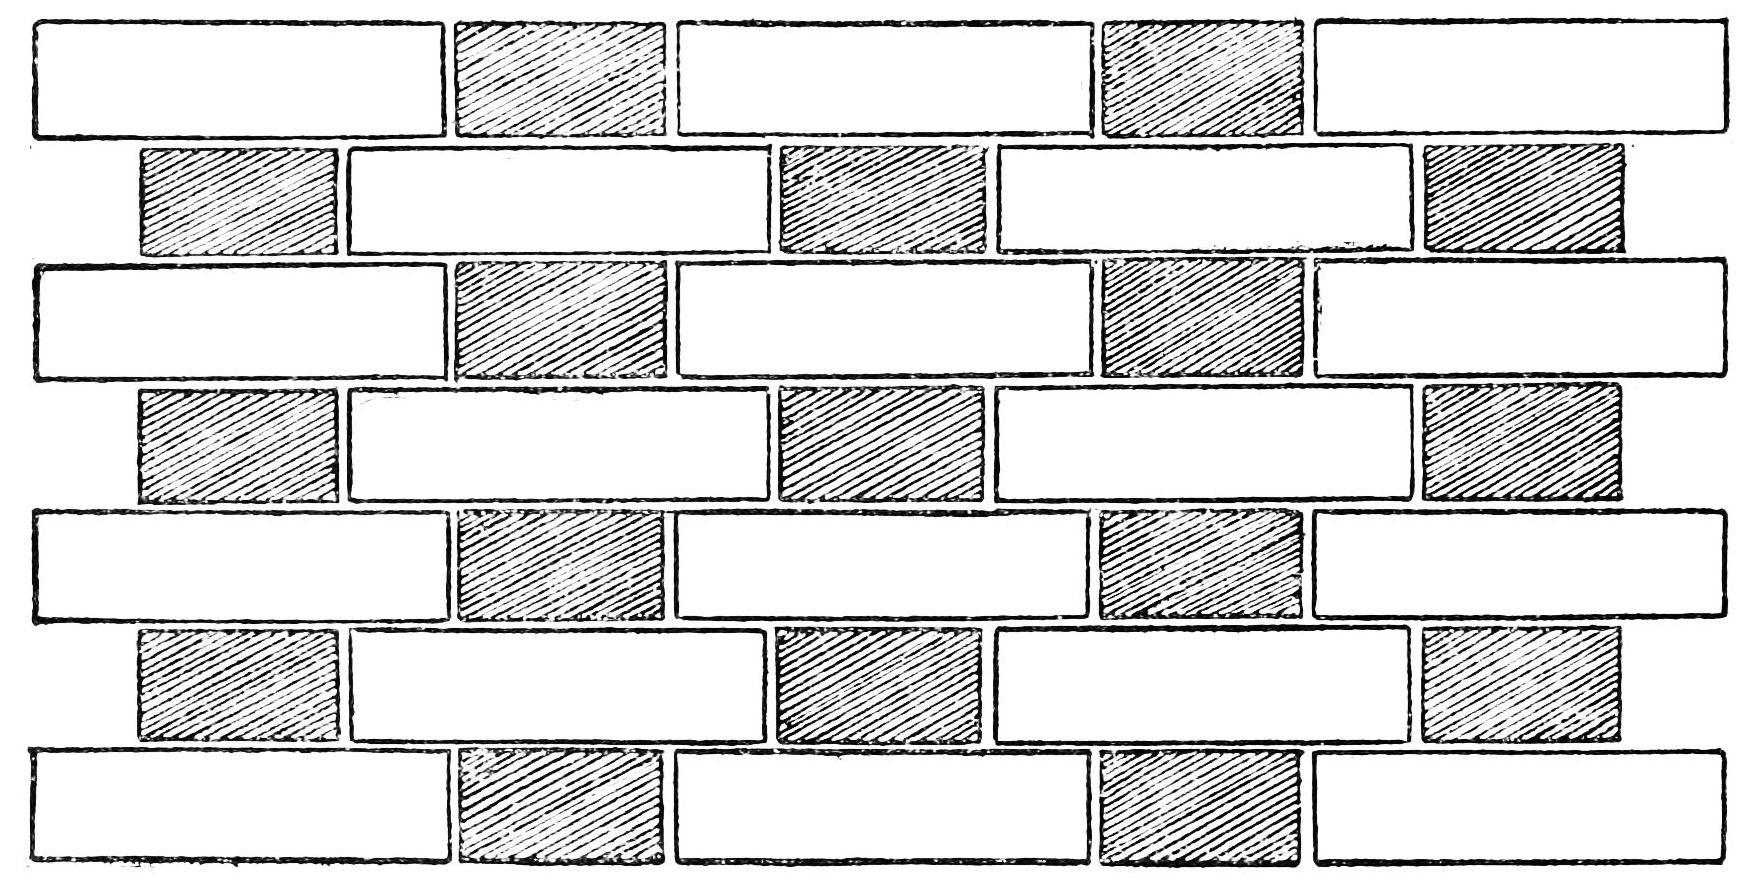 printable brick wall coloring pages - photo#19